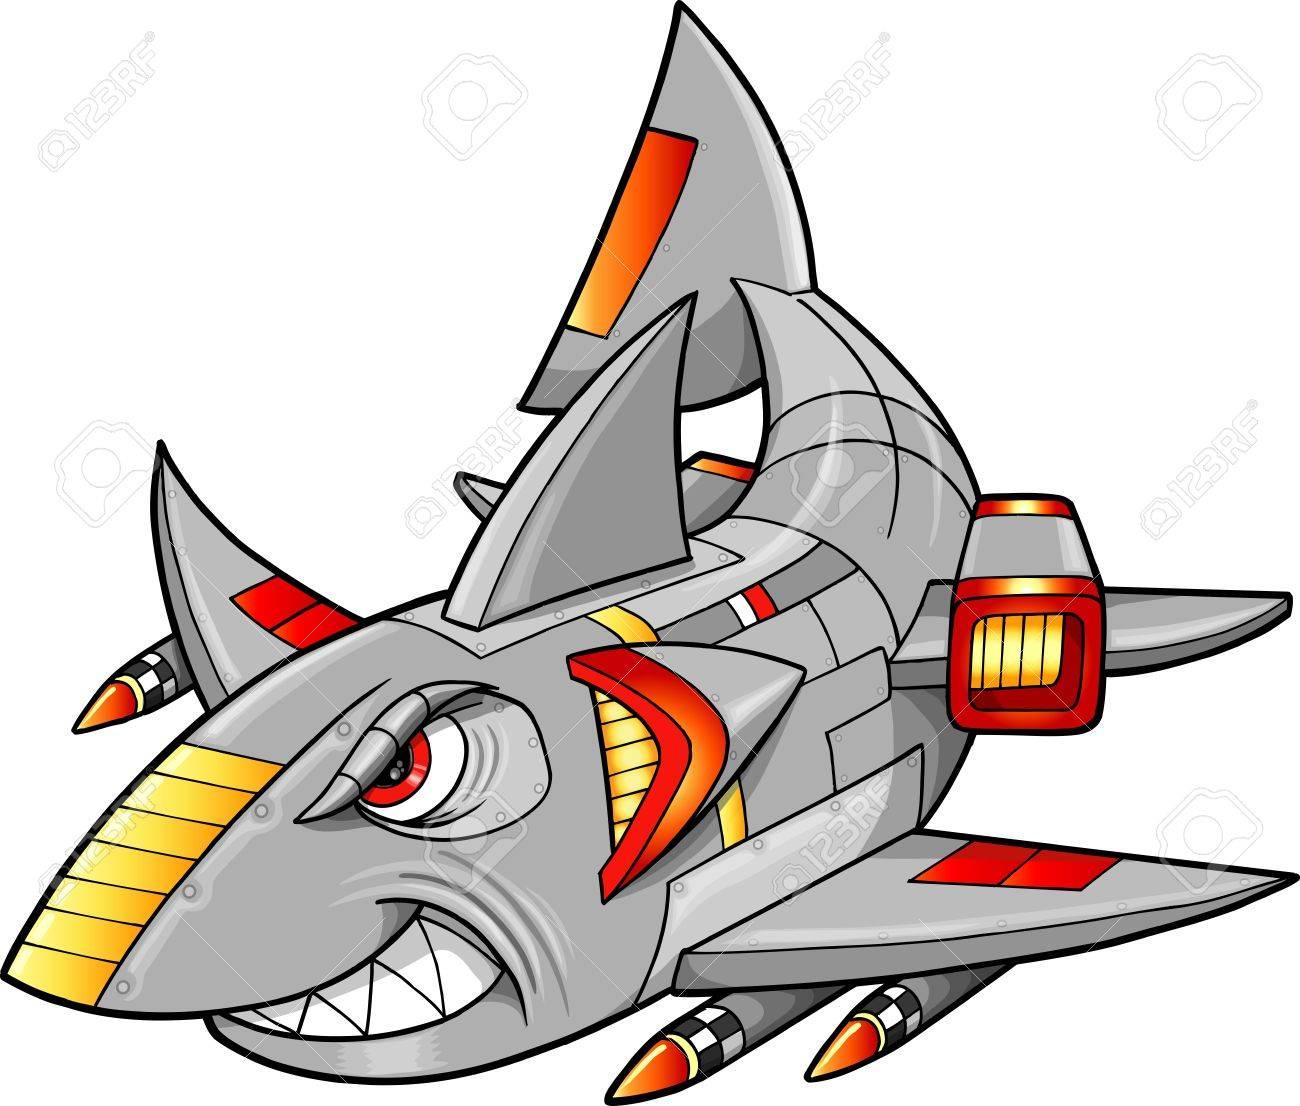 Metal Armed Robot Cyborg Shark Vector Illustration Stock Vector - 13269602